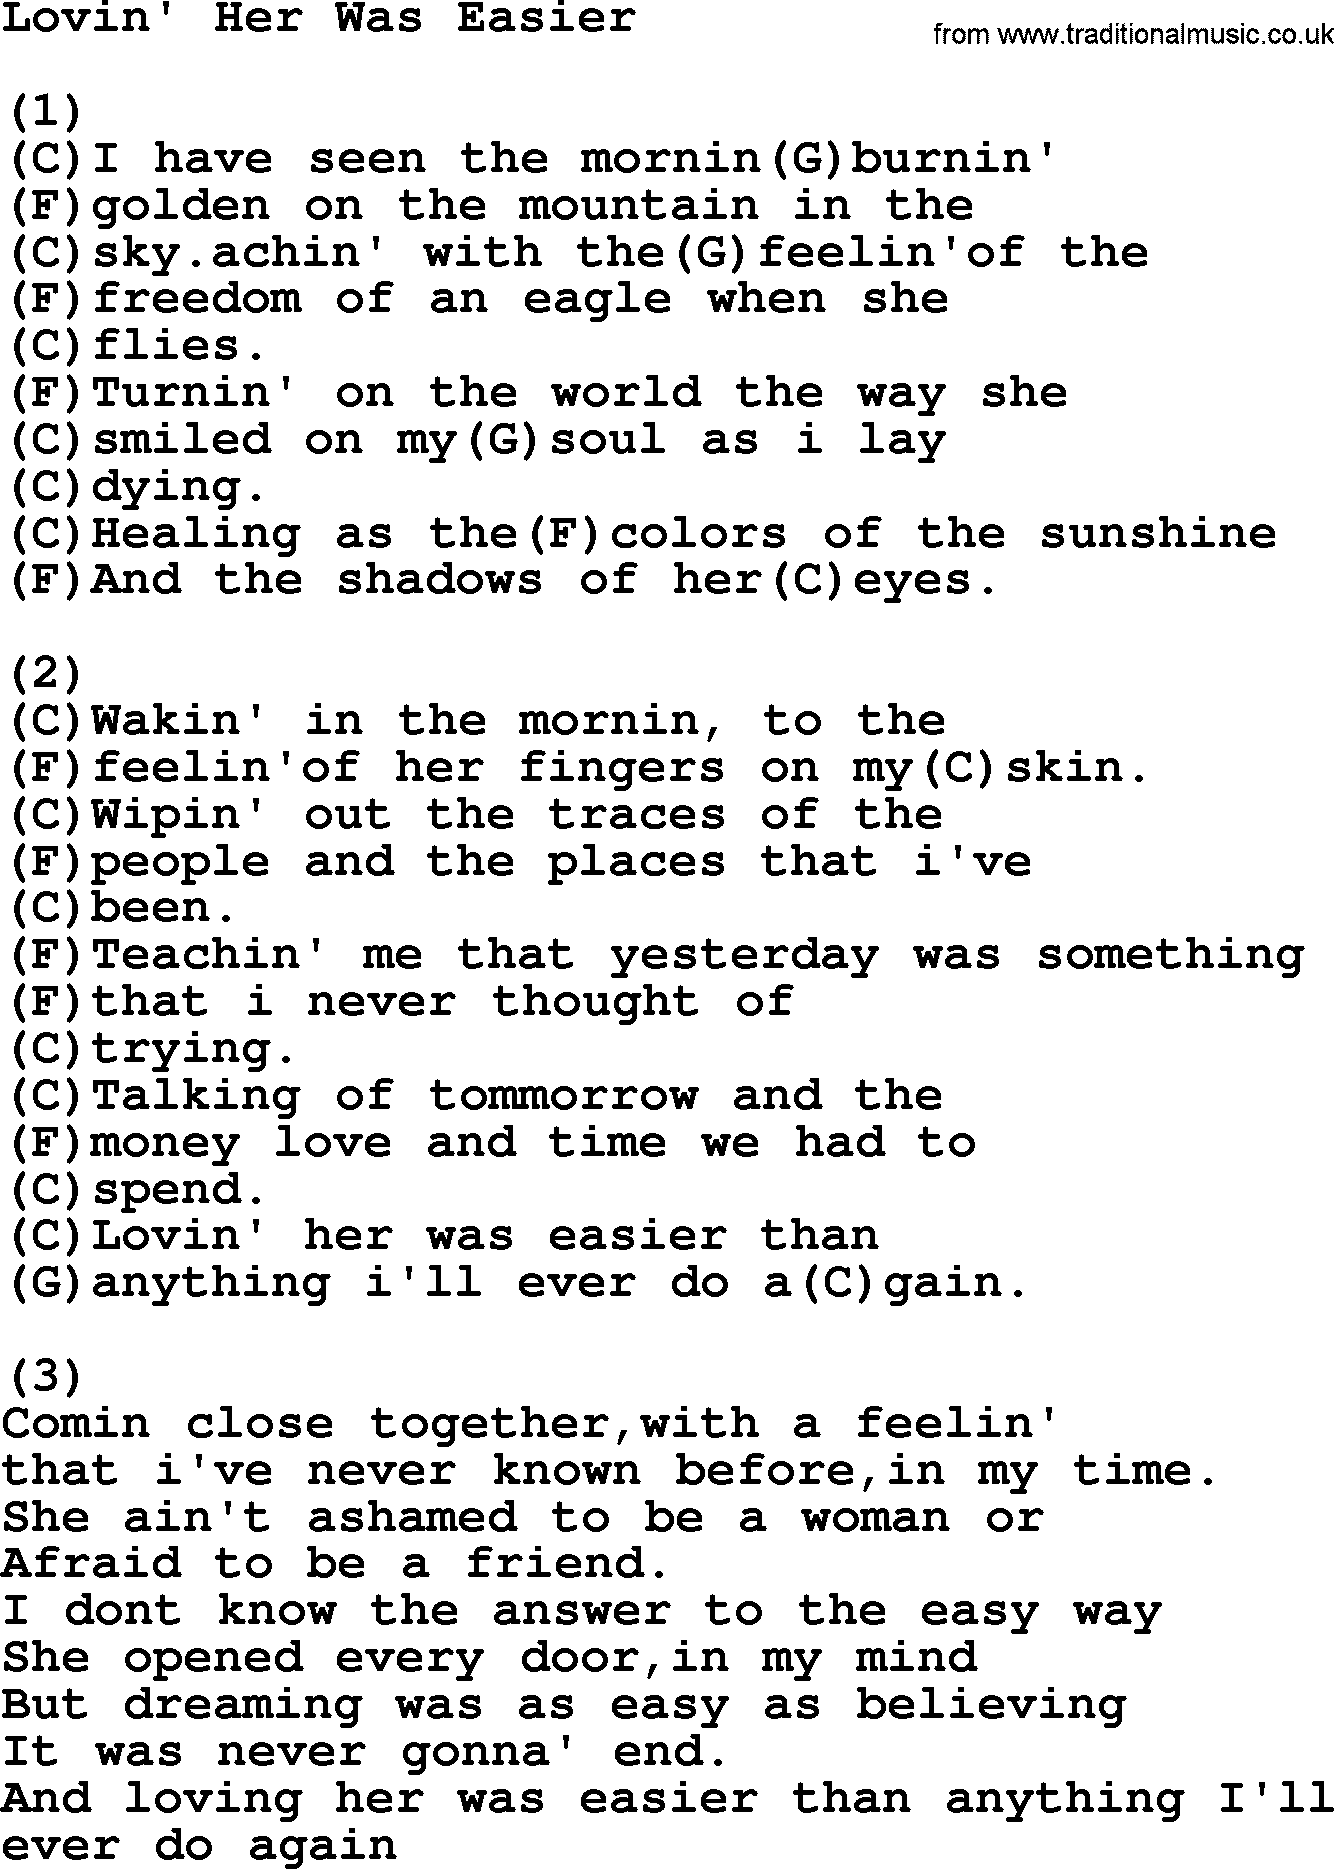 Kris Kristofferson song: Lovin' Her Was Easier lyrics and